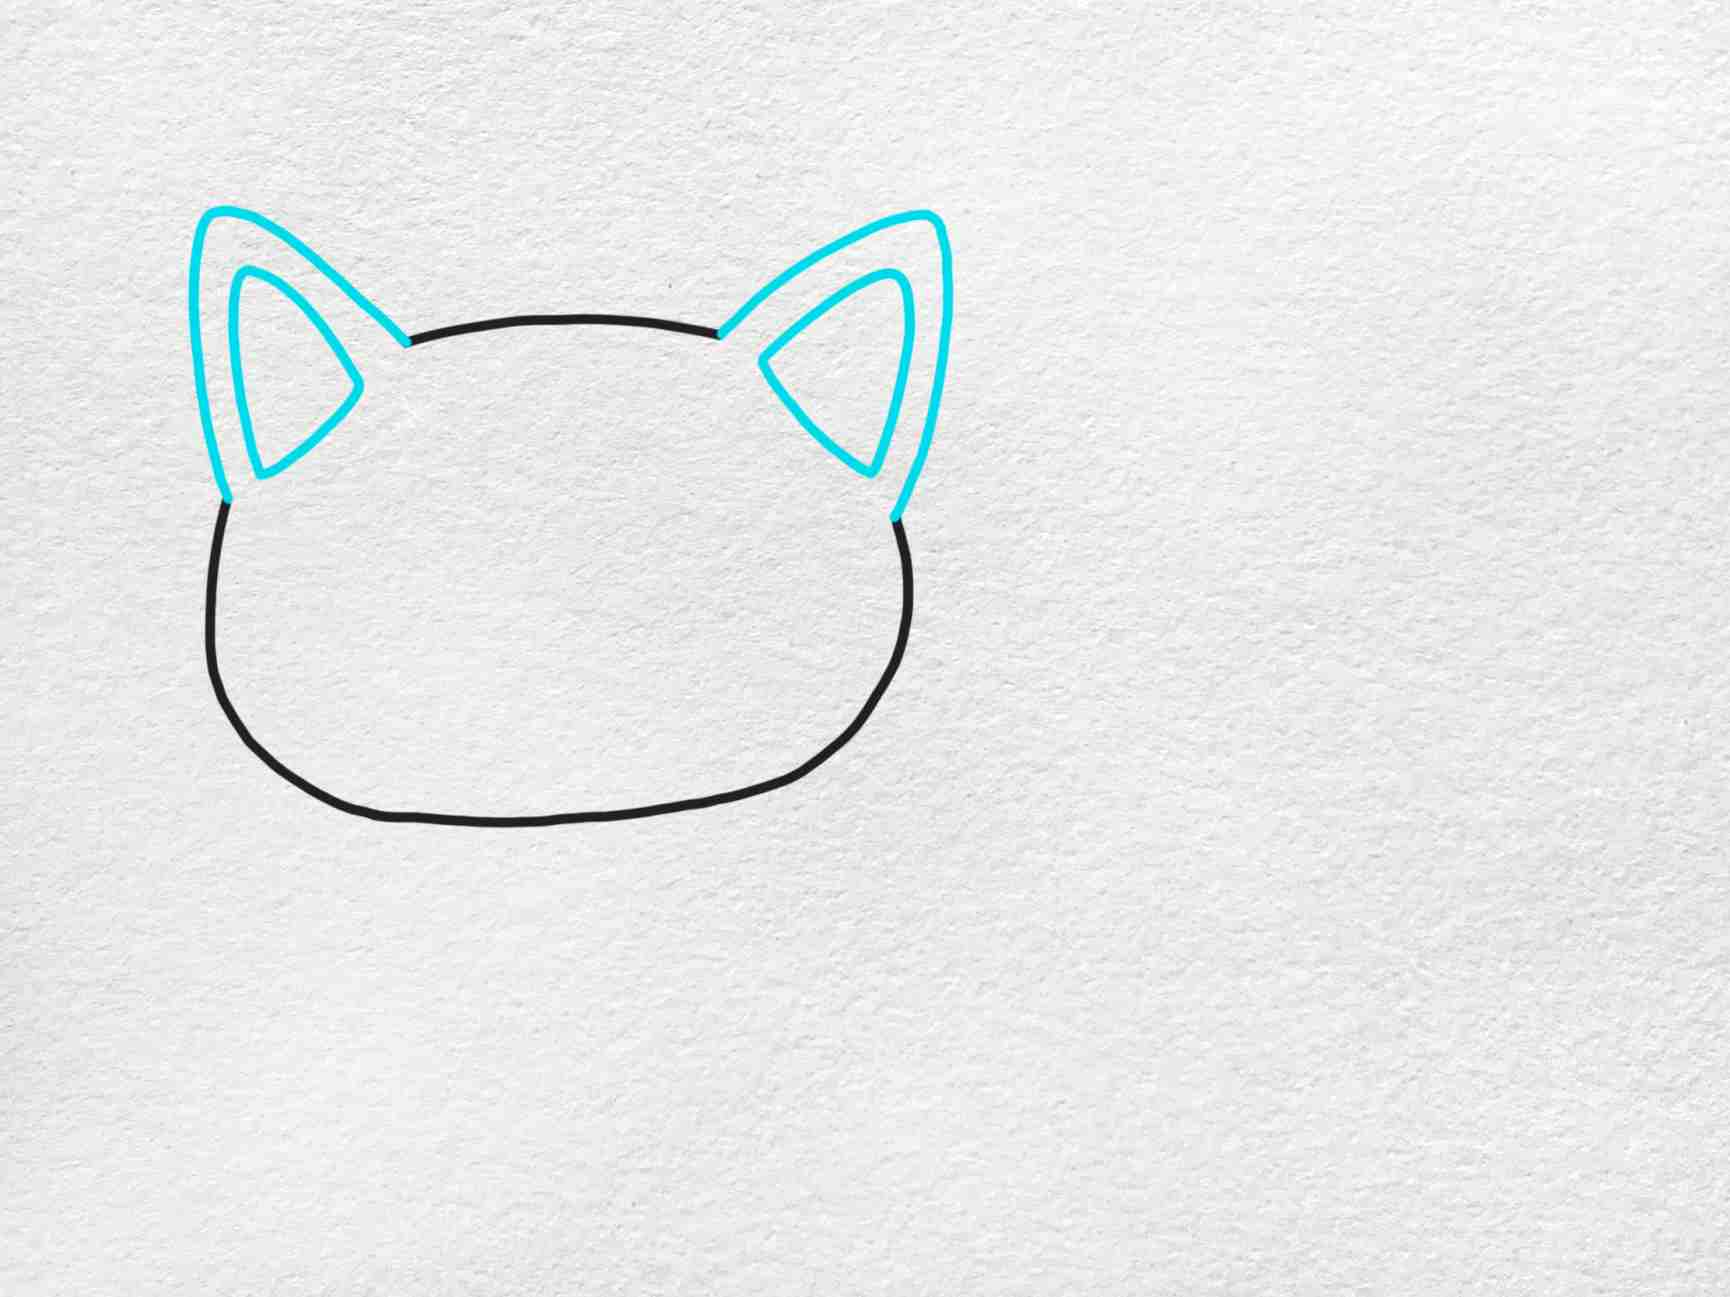 Fat Cat Drawing: Step 2